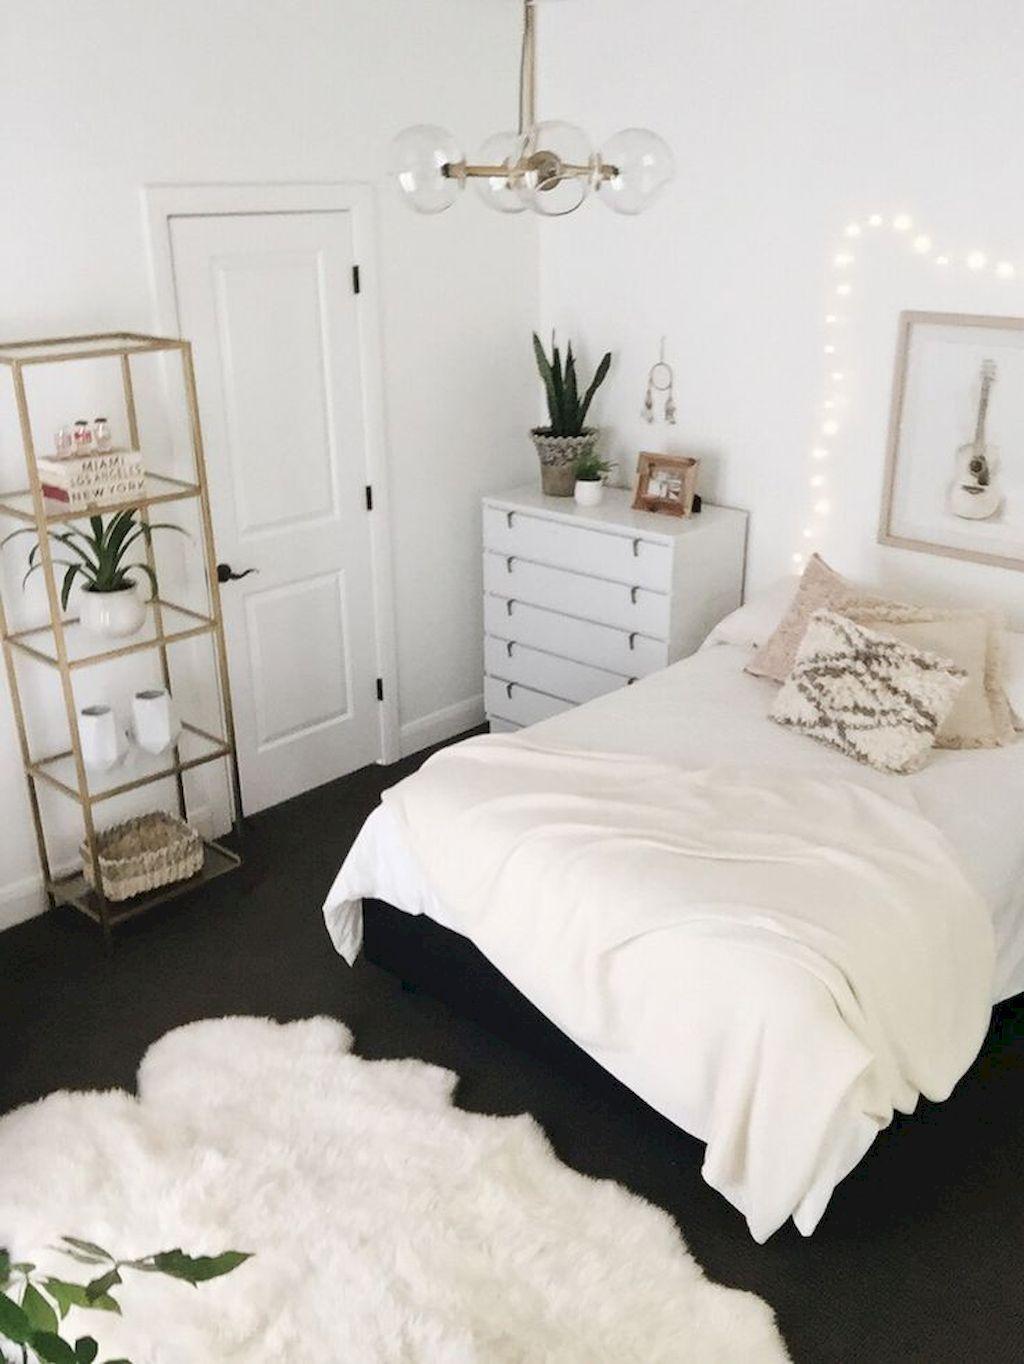 Master bedroom nightstand decor   Beautiful Small Master Bedroom Decor Ideas  Small master bedroom